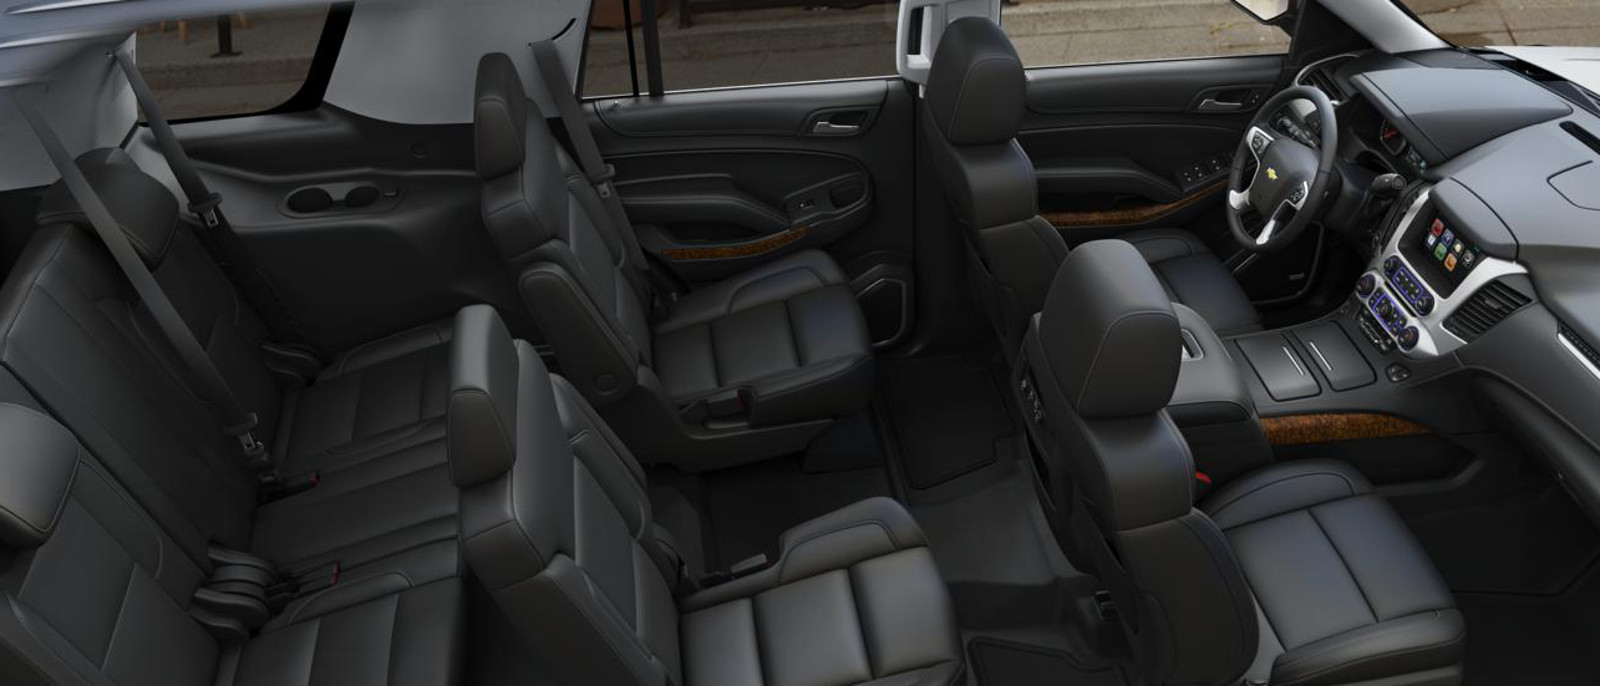 2016 Chevrolet Tahoe Interior